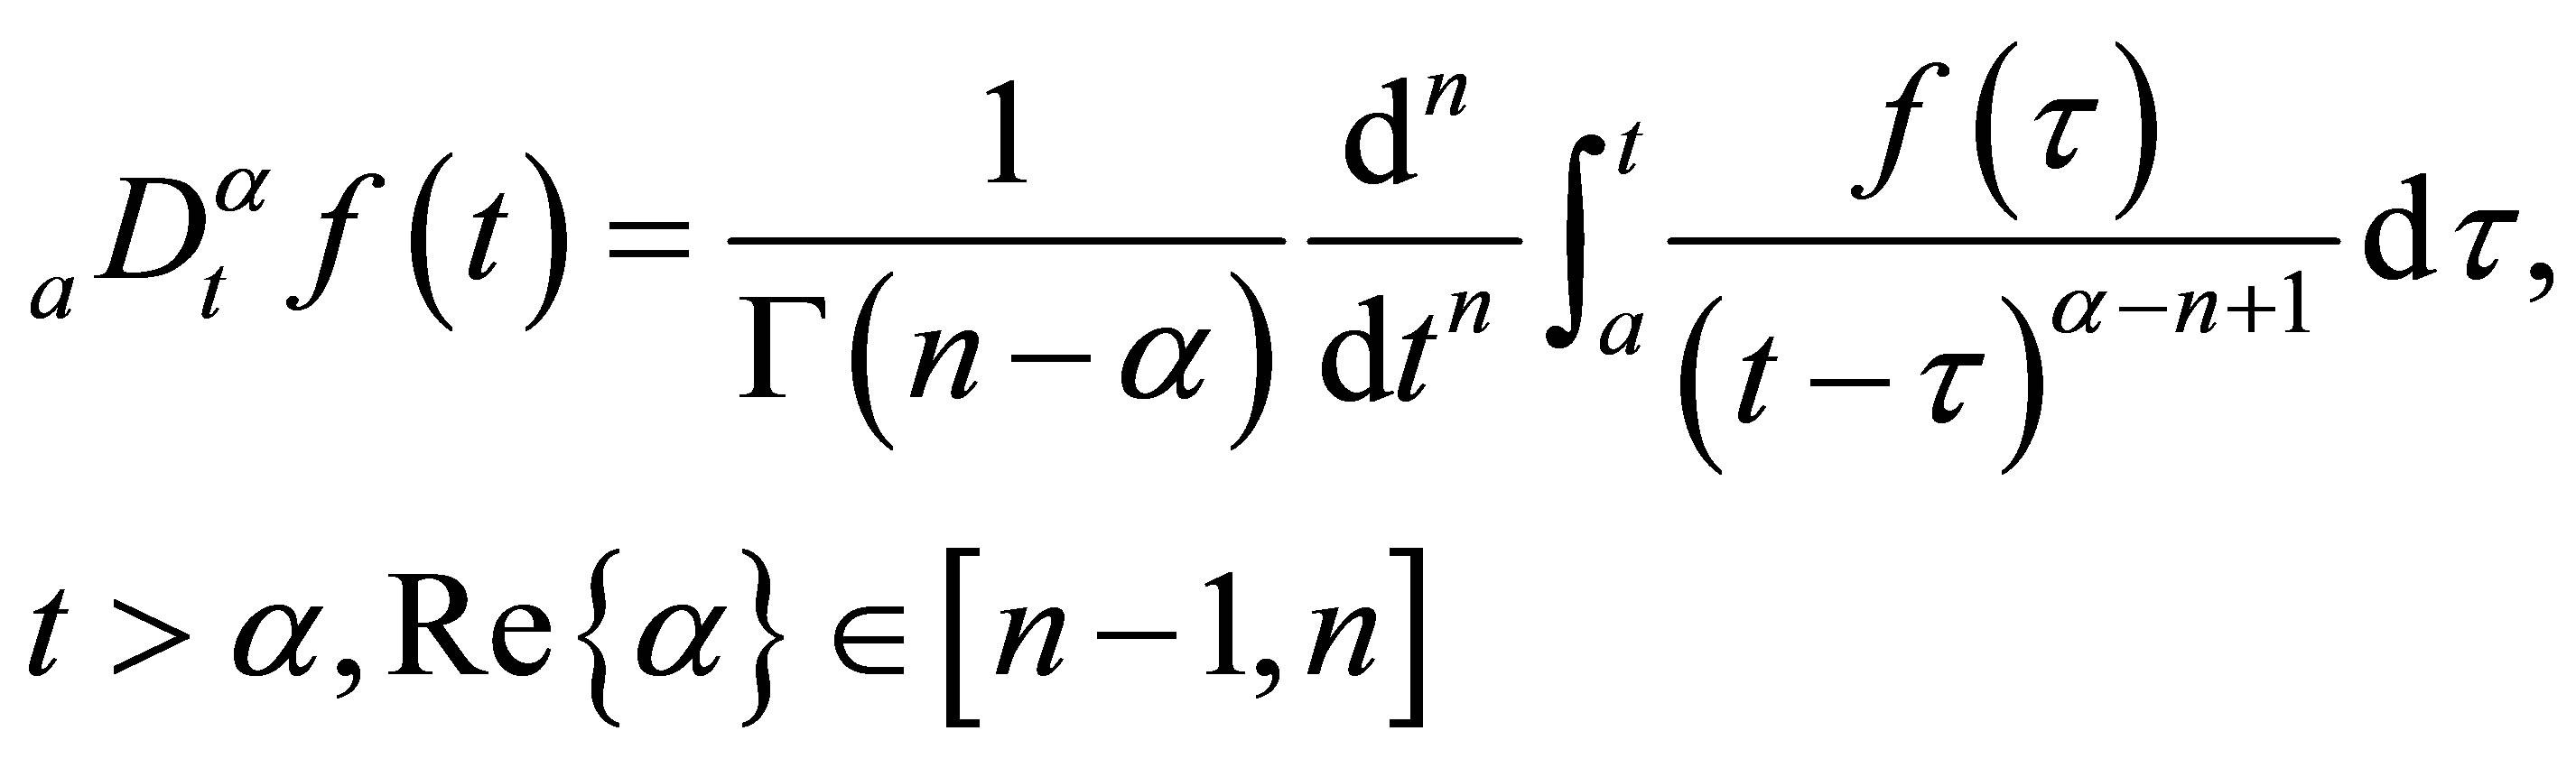 Dynamics and Synchronization of Memristor-Based Fractional-Order ...